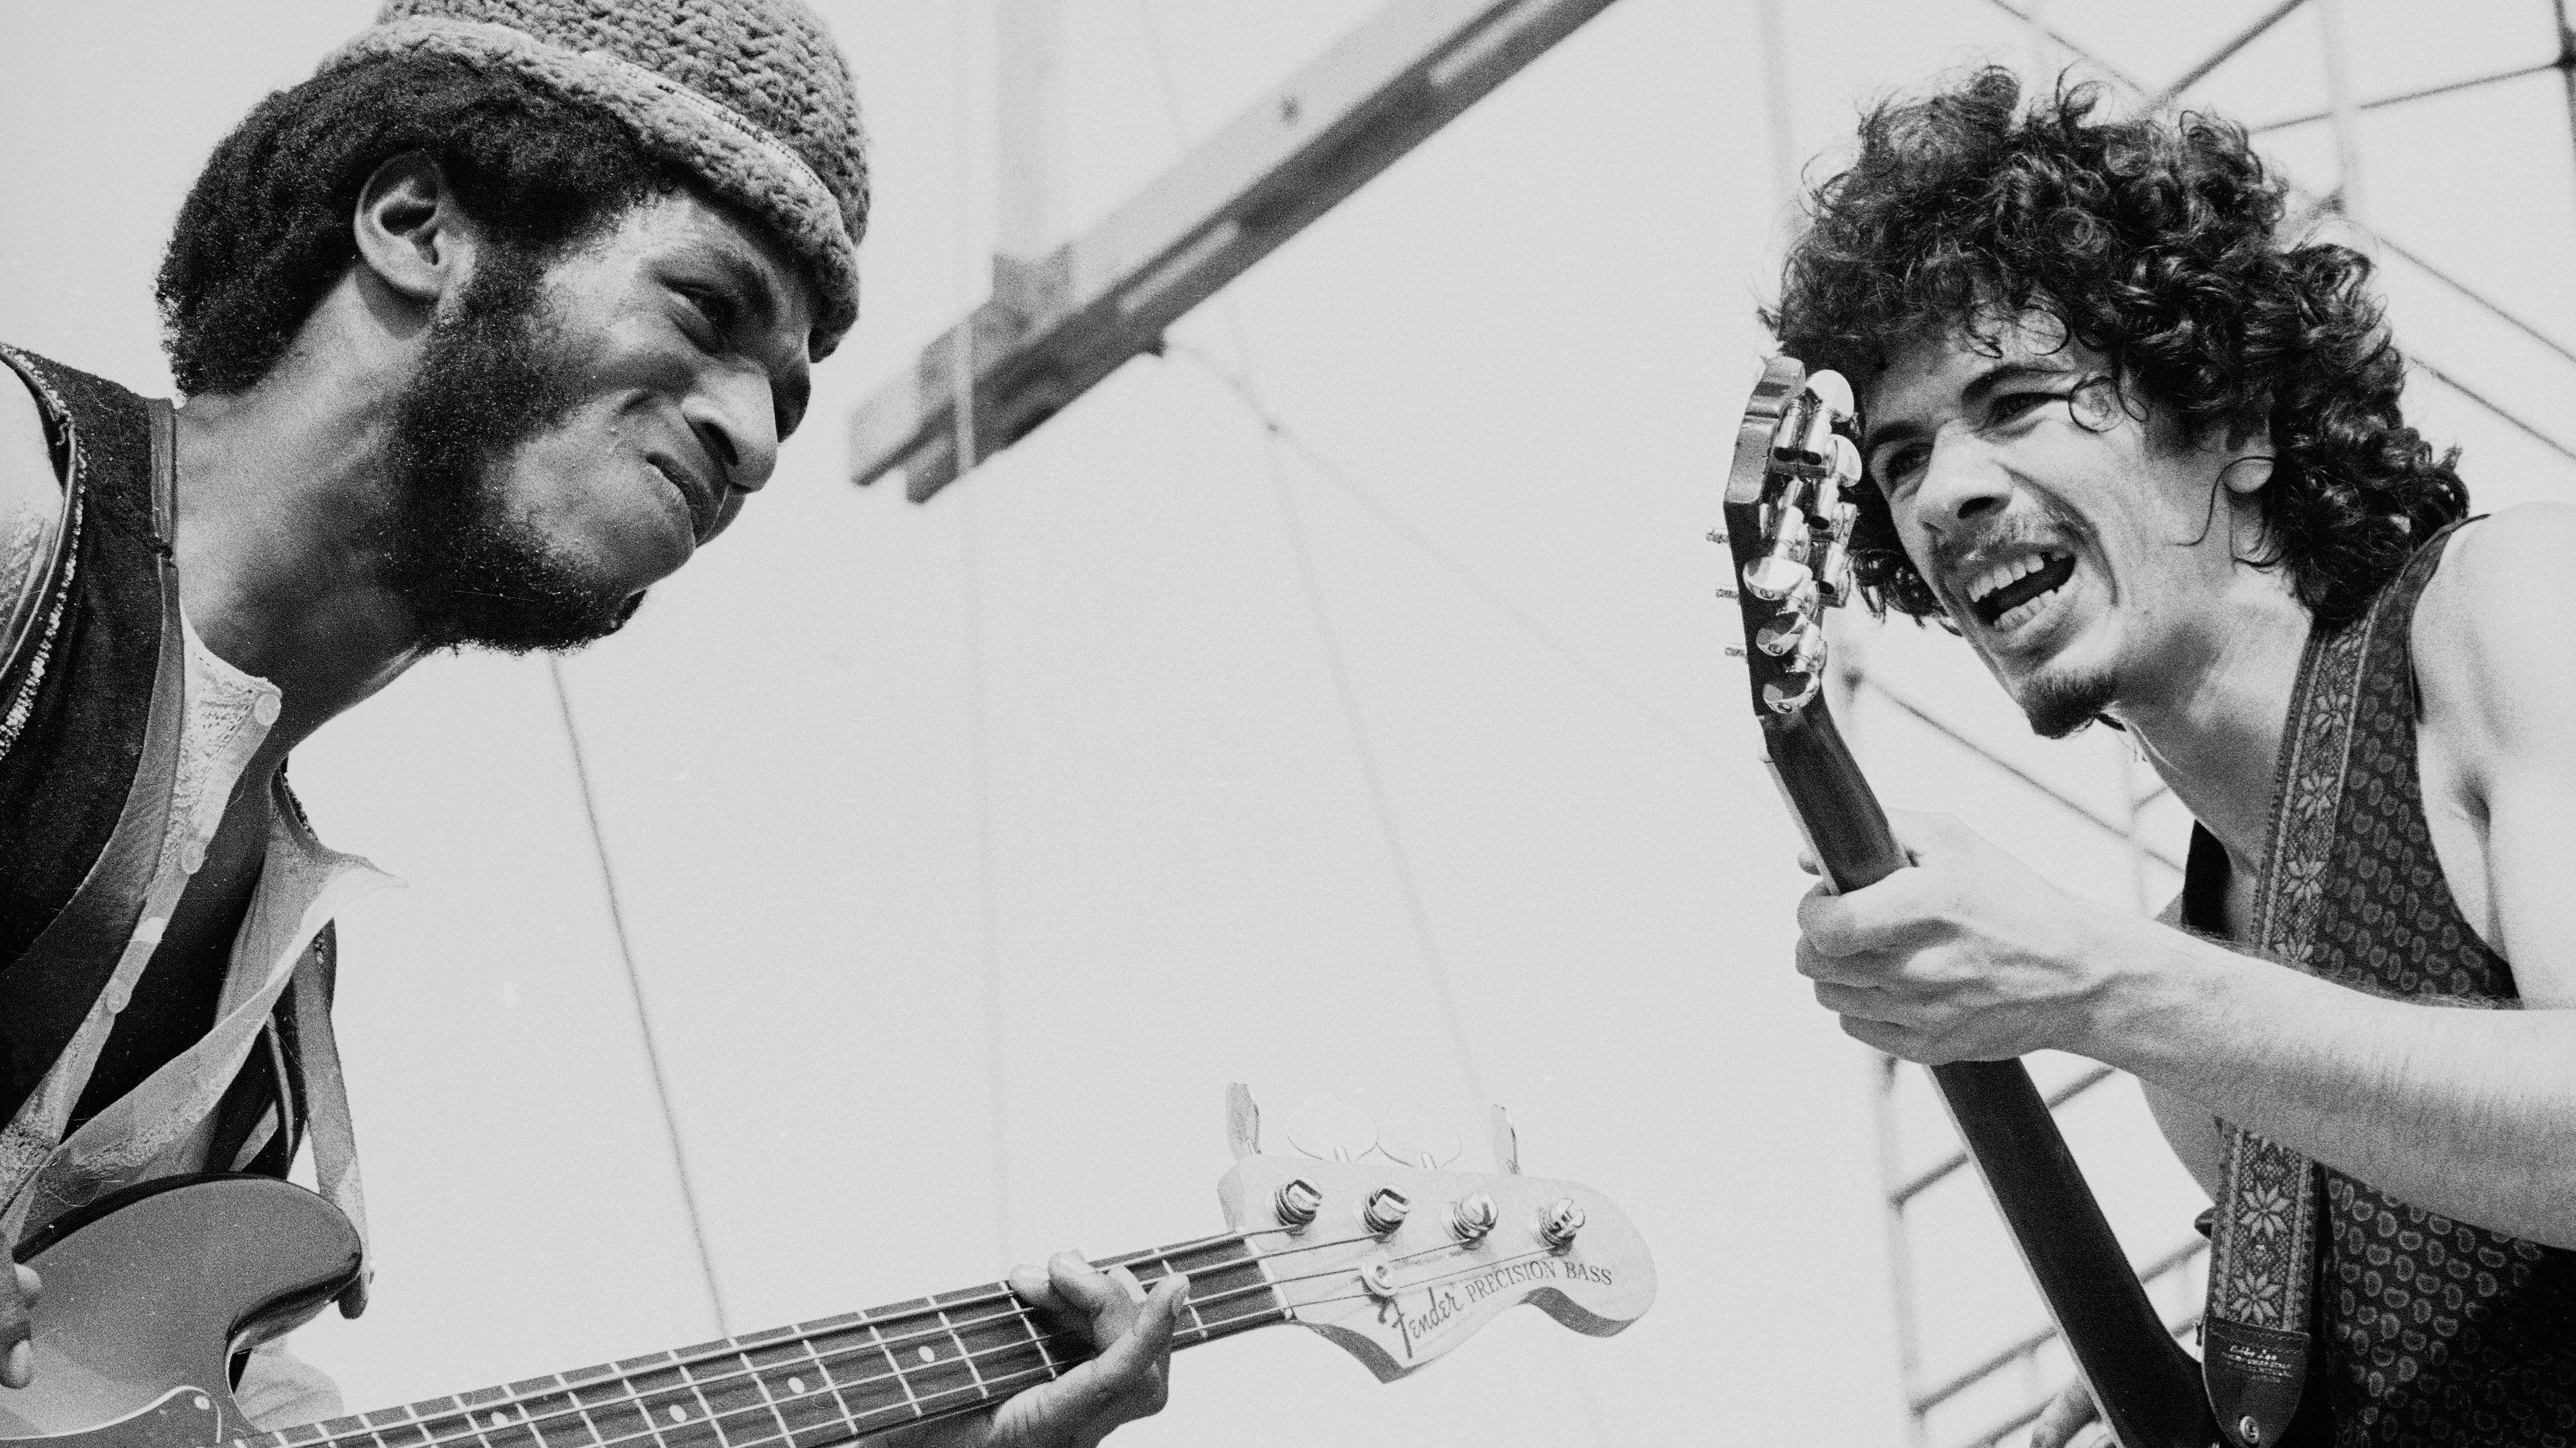 Santana's Debut Album Turns 50 Years Old